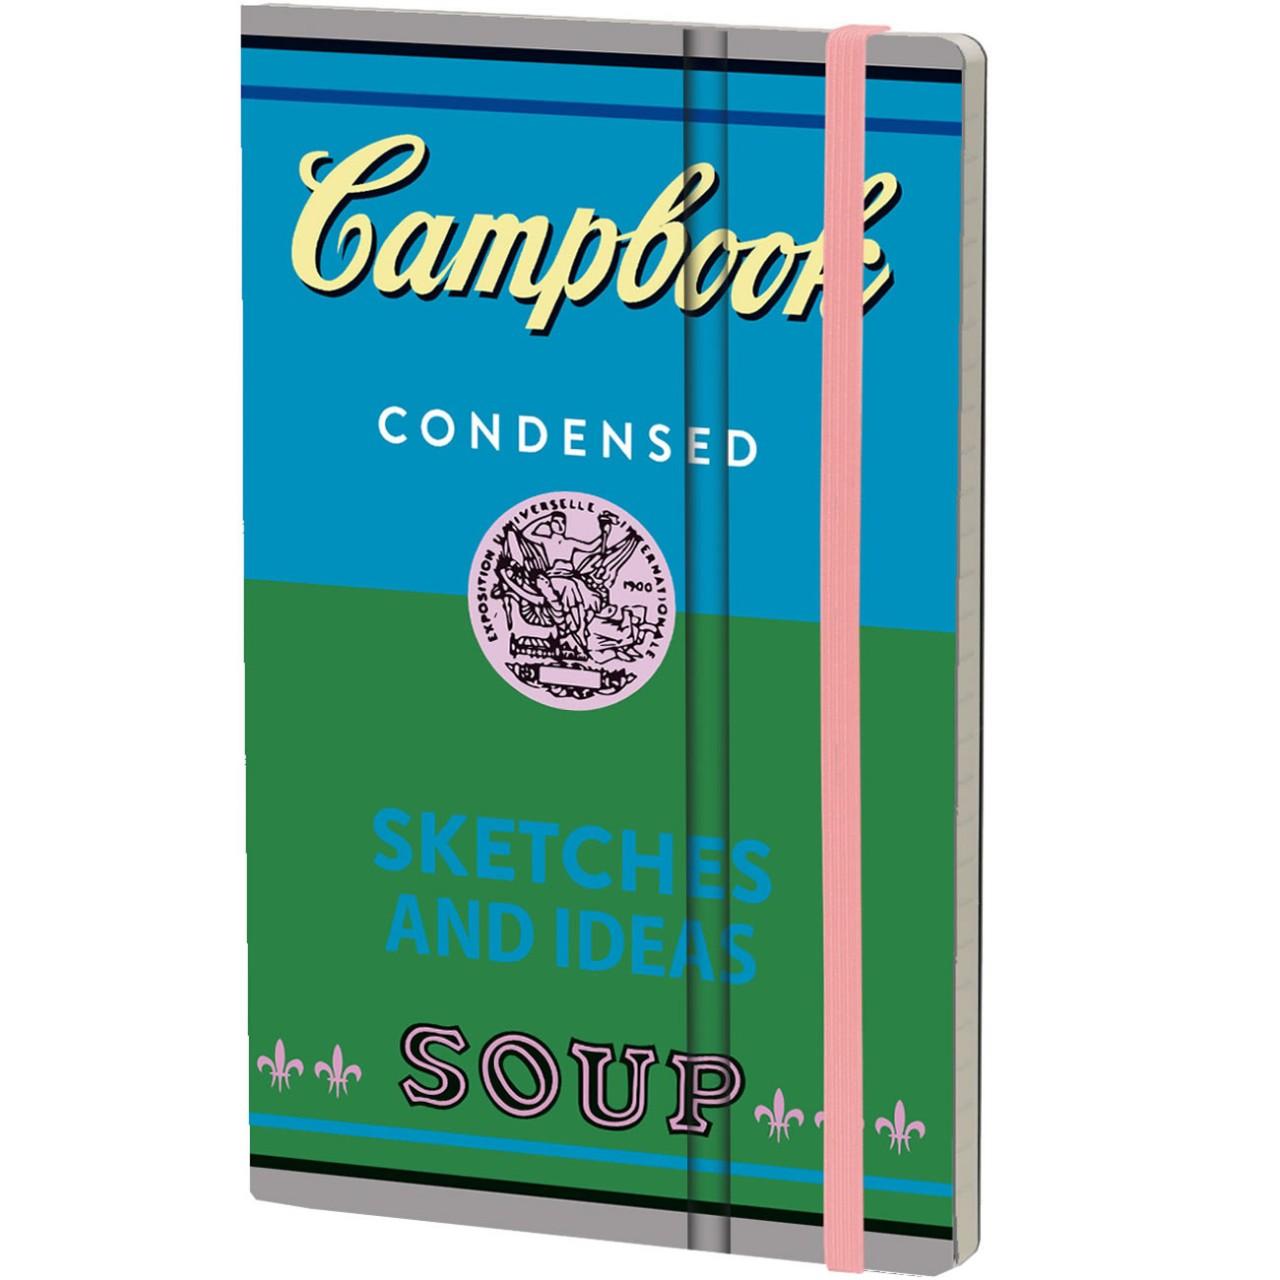 Stifflexible Notizbuch CAMPBOOK 13 x 21 cm 192 S., SKETCHES AND IDEAS